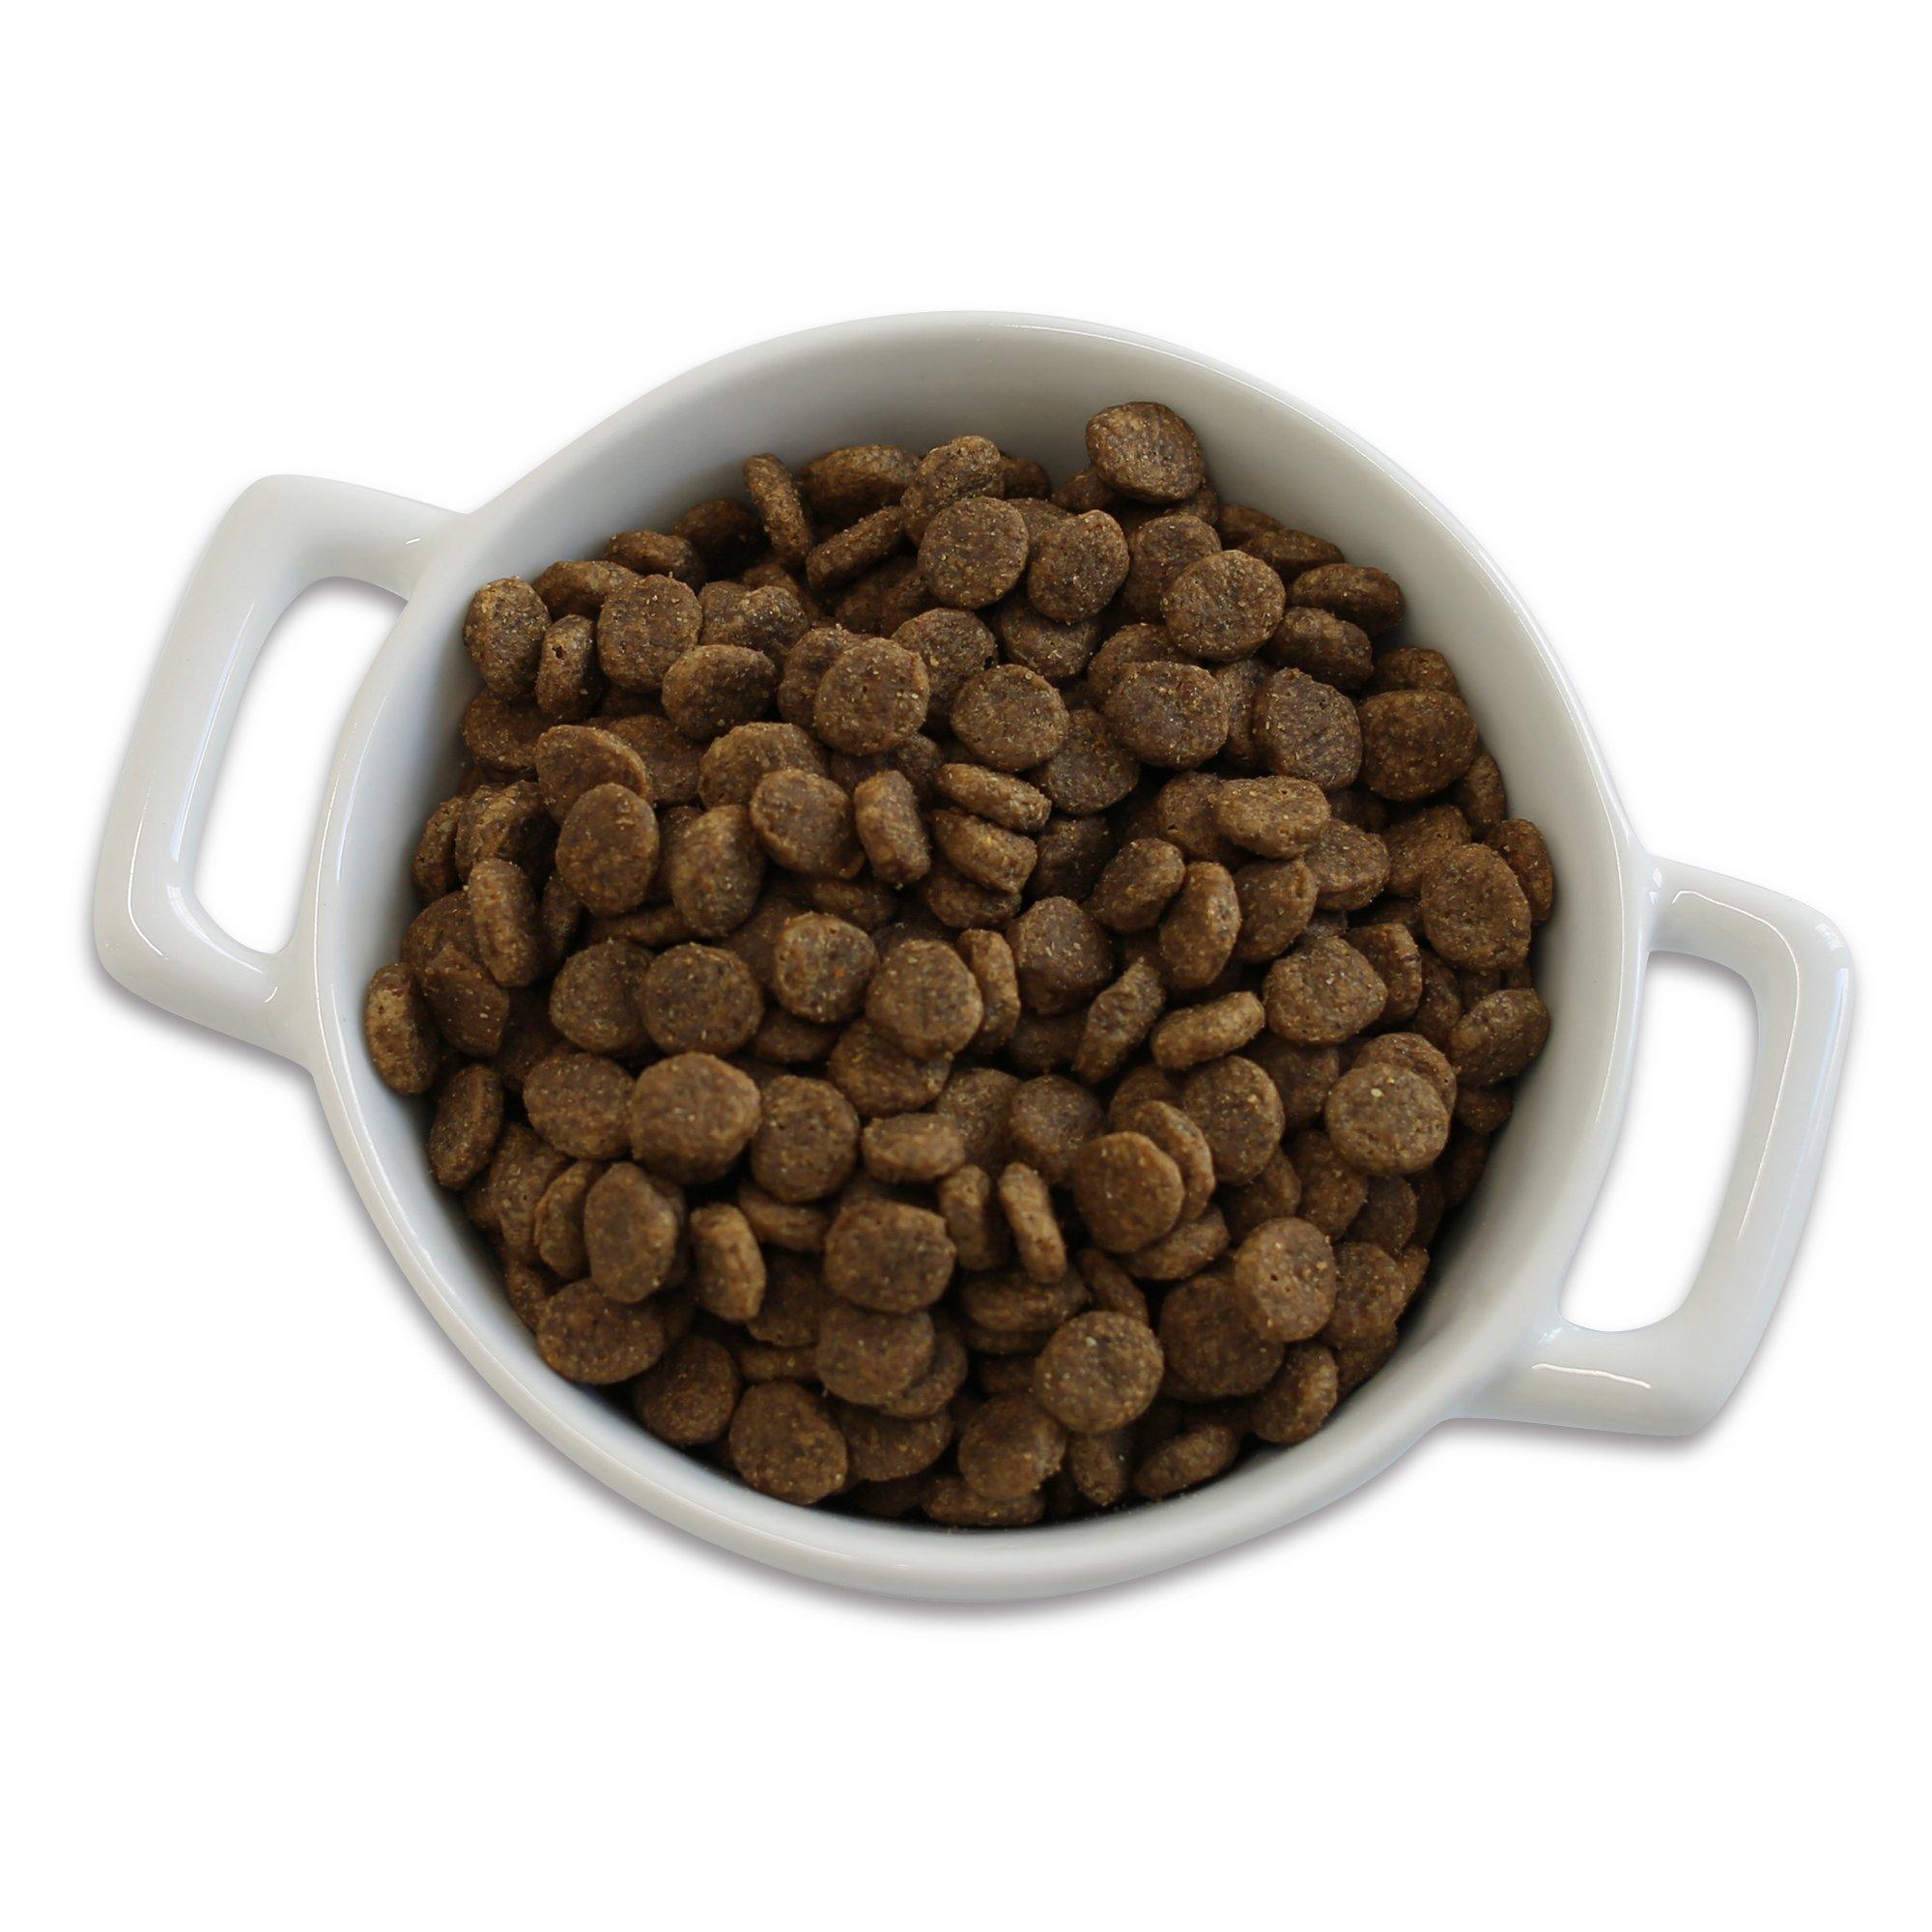 Castor & Pollux Organix Grain Free Organic Chicken & Sweet Potato Recipe Dry Dog Food 18Lbs by Castor & Pollux (Image #6)